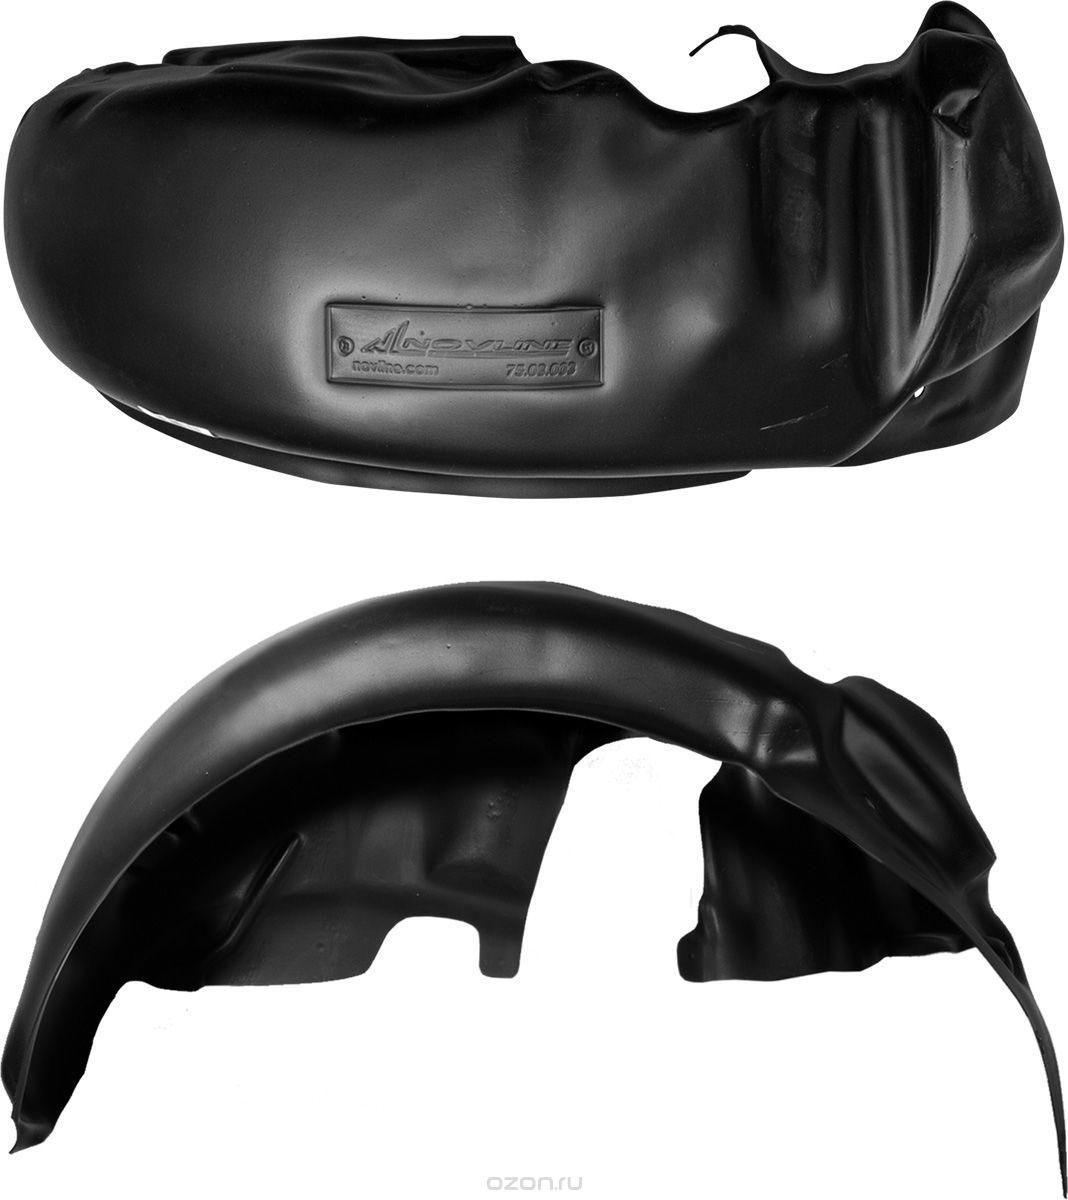 Подкрылок Novline-Autofamily, для Chevrolet Lacetti, 2004-2013, хэтчбек, седан, задний правый подкрылок novline autofamily chevrolet cobalt 2013 седан